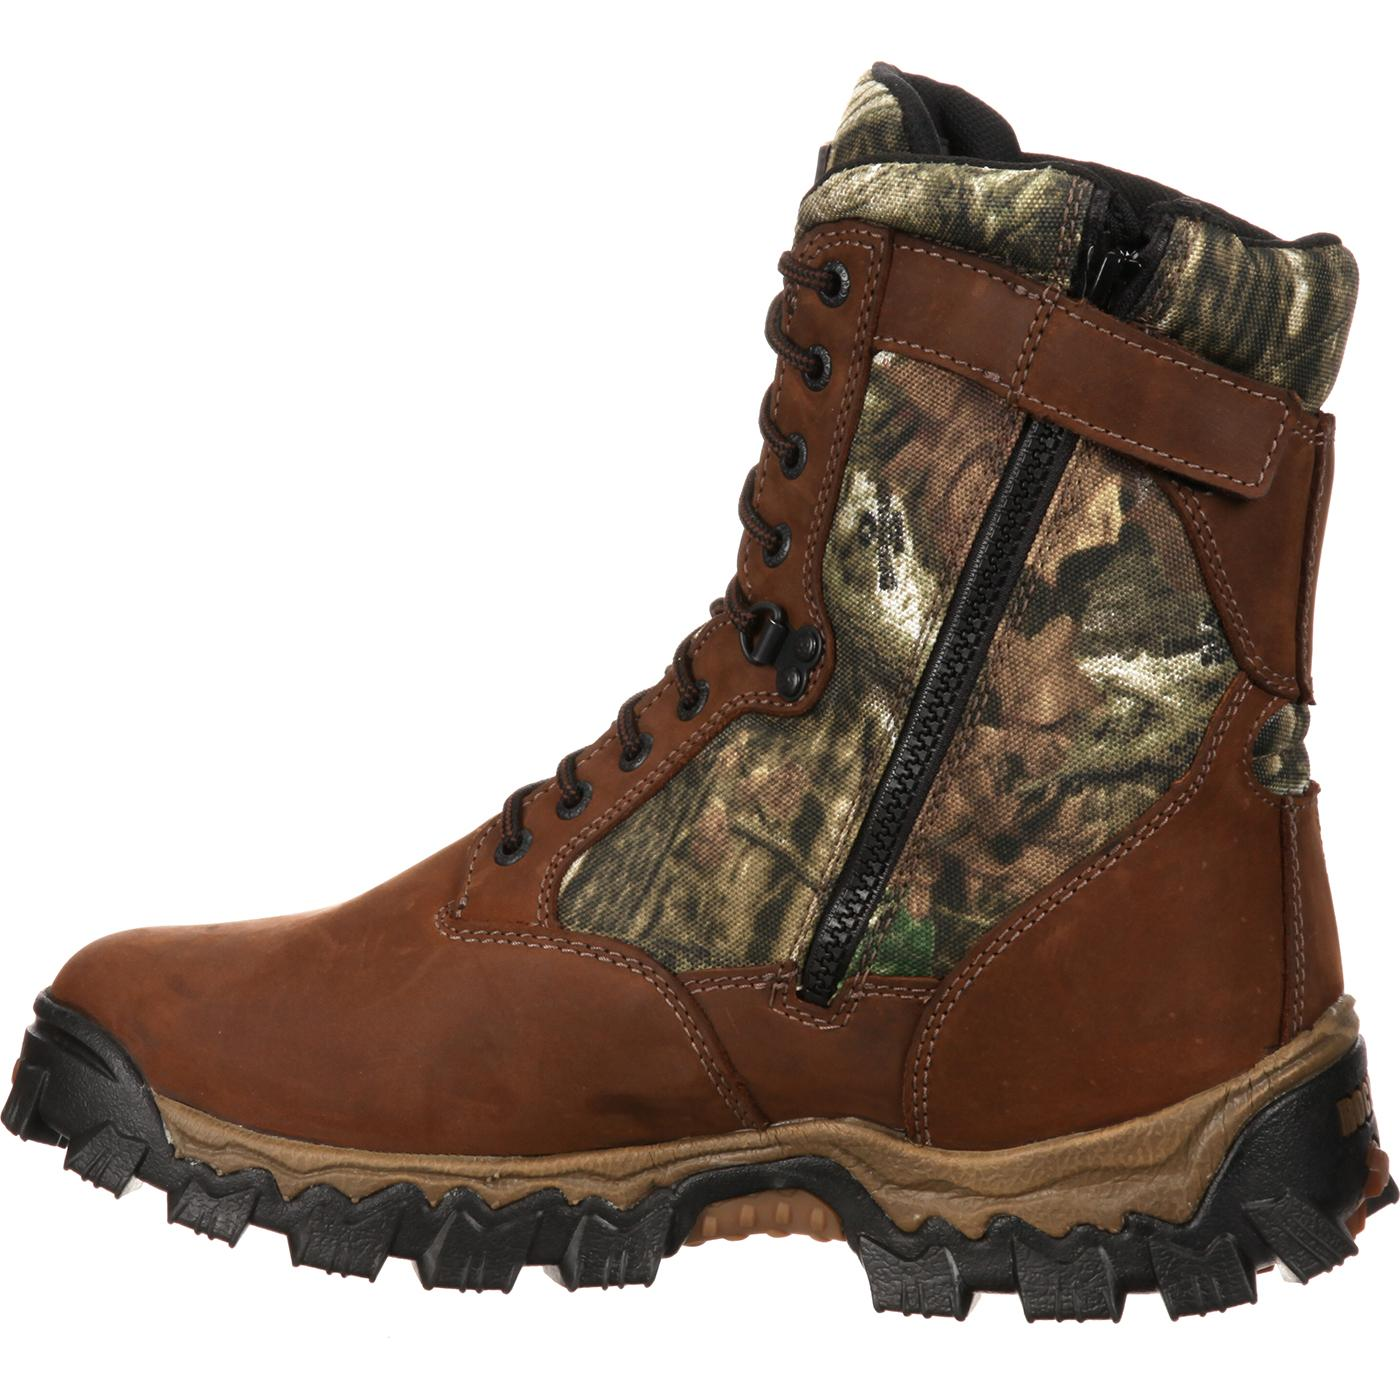 Rocky Alphaforce Waterproof Insulated Outdoor Boot Rkys044